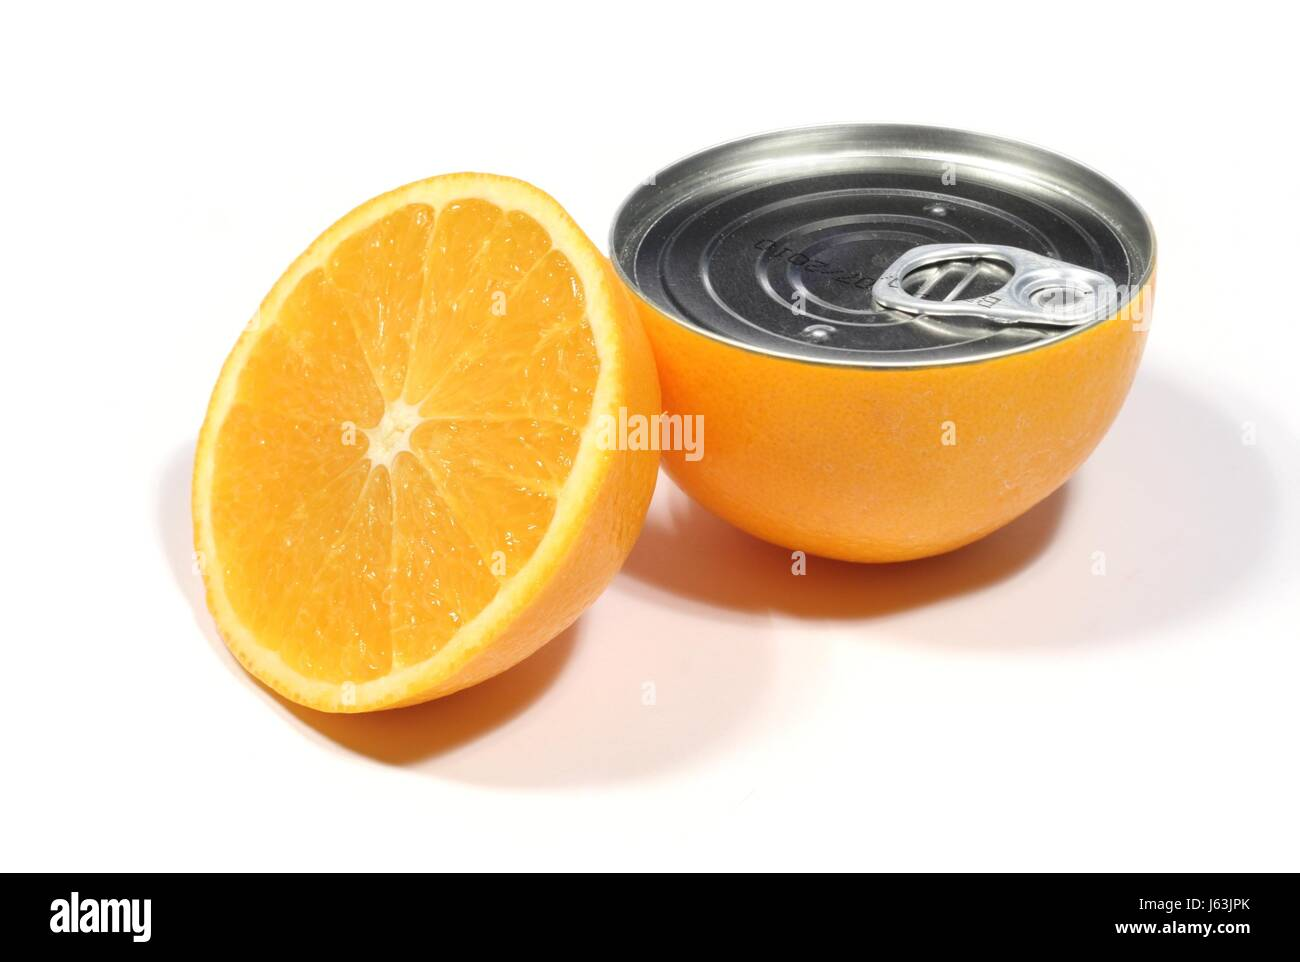 orange vitamins vitamines photo composition conserve supportability orange food - Stock Image